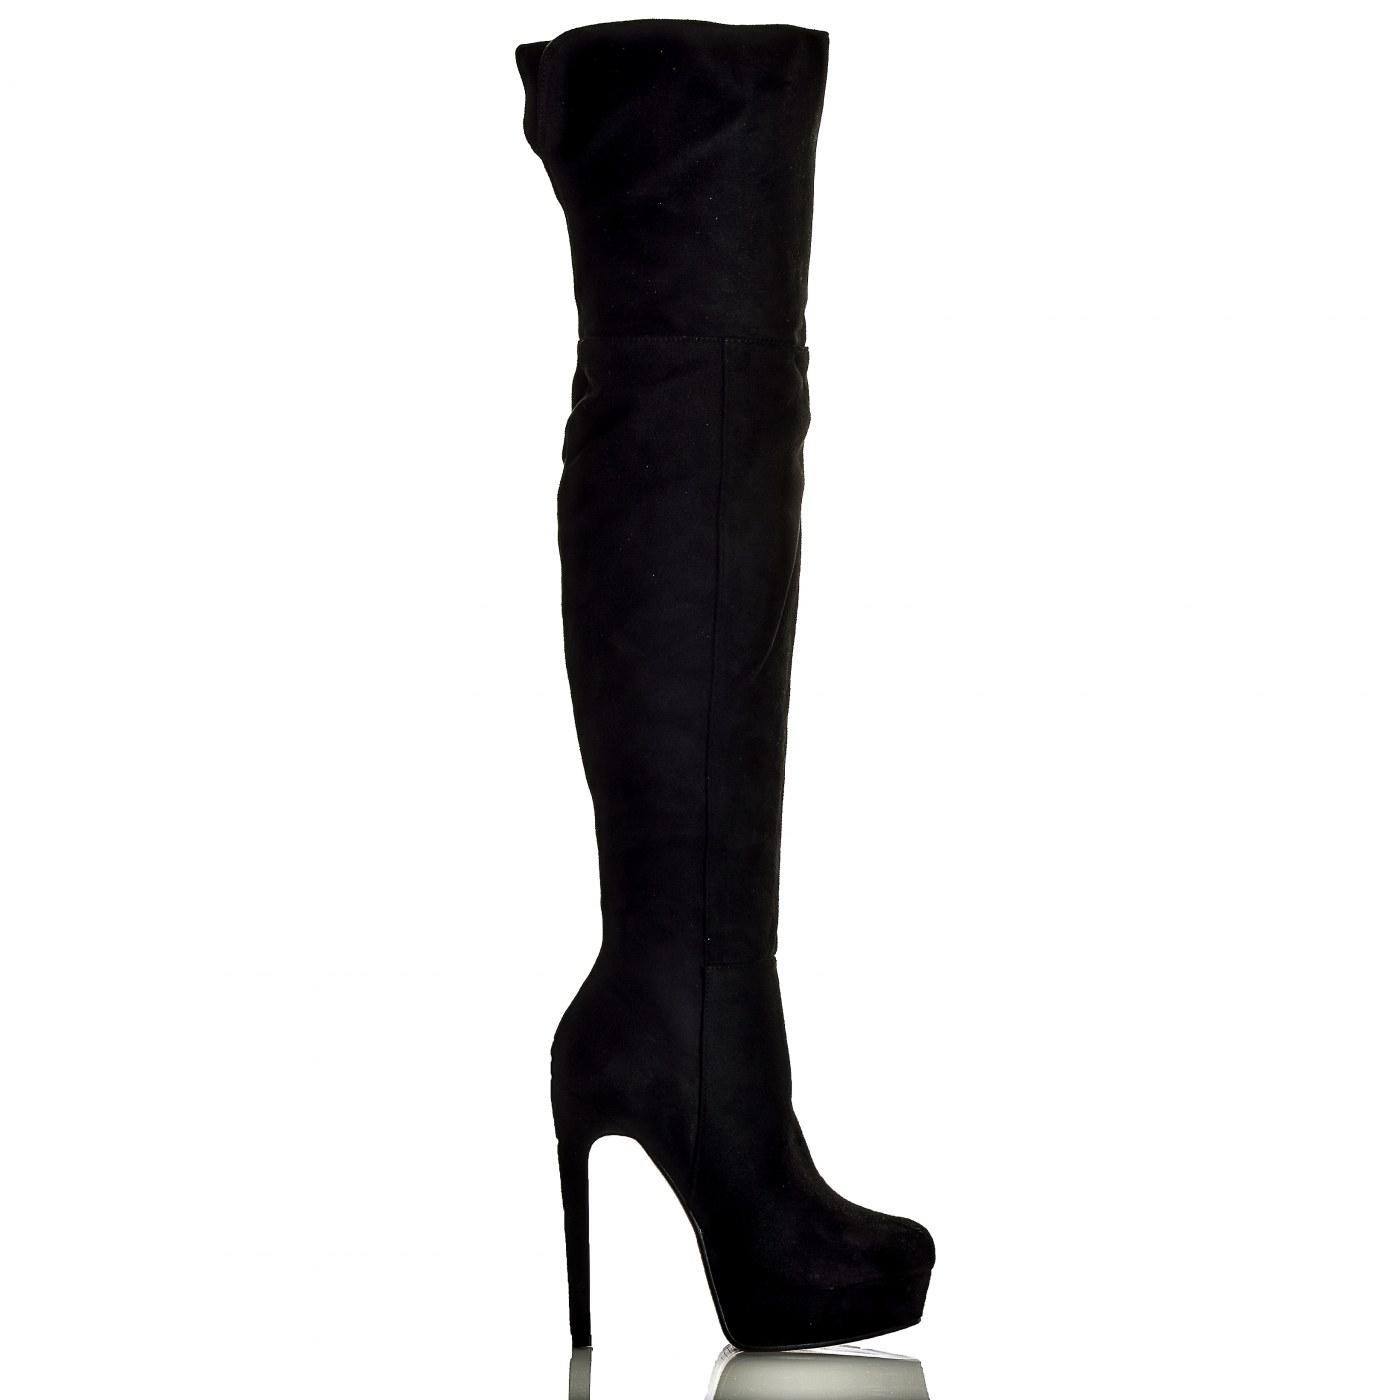 ee922eeb836 Γυναικείες Μαύρες Μπότες Με Στιλέτο Τακούνι Οver the knee | BlackOut ...